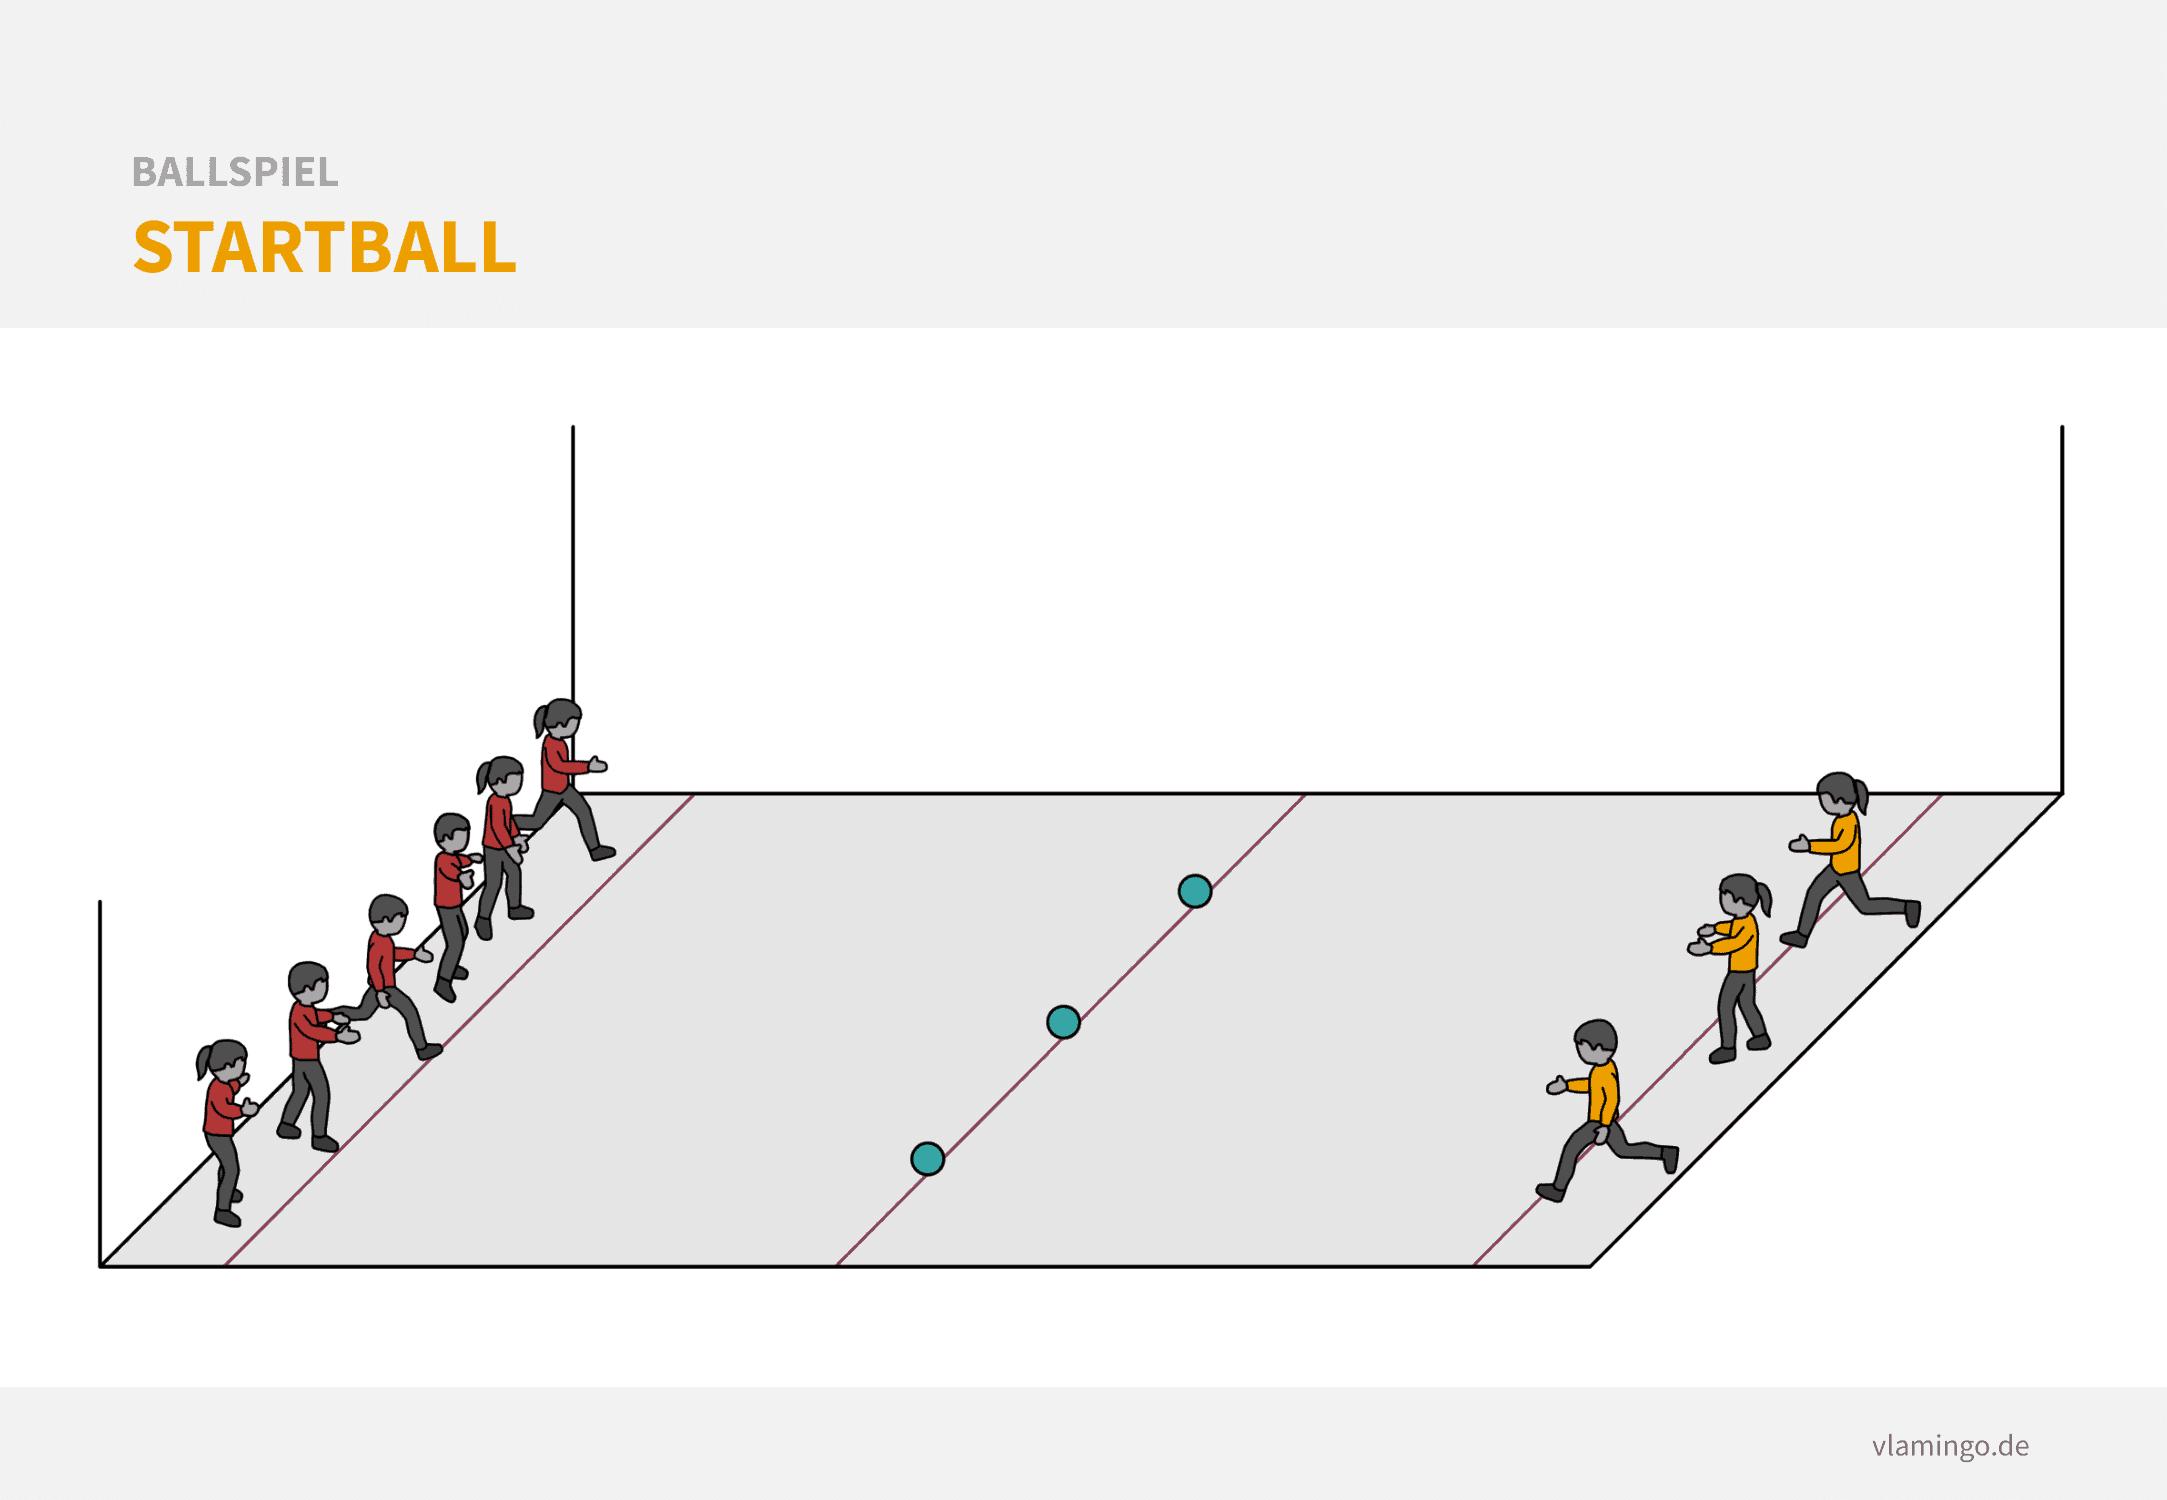 Ballspiel: Startball